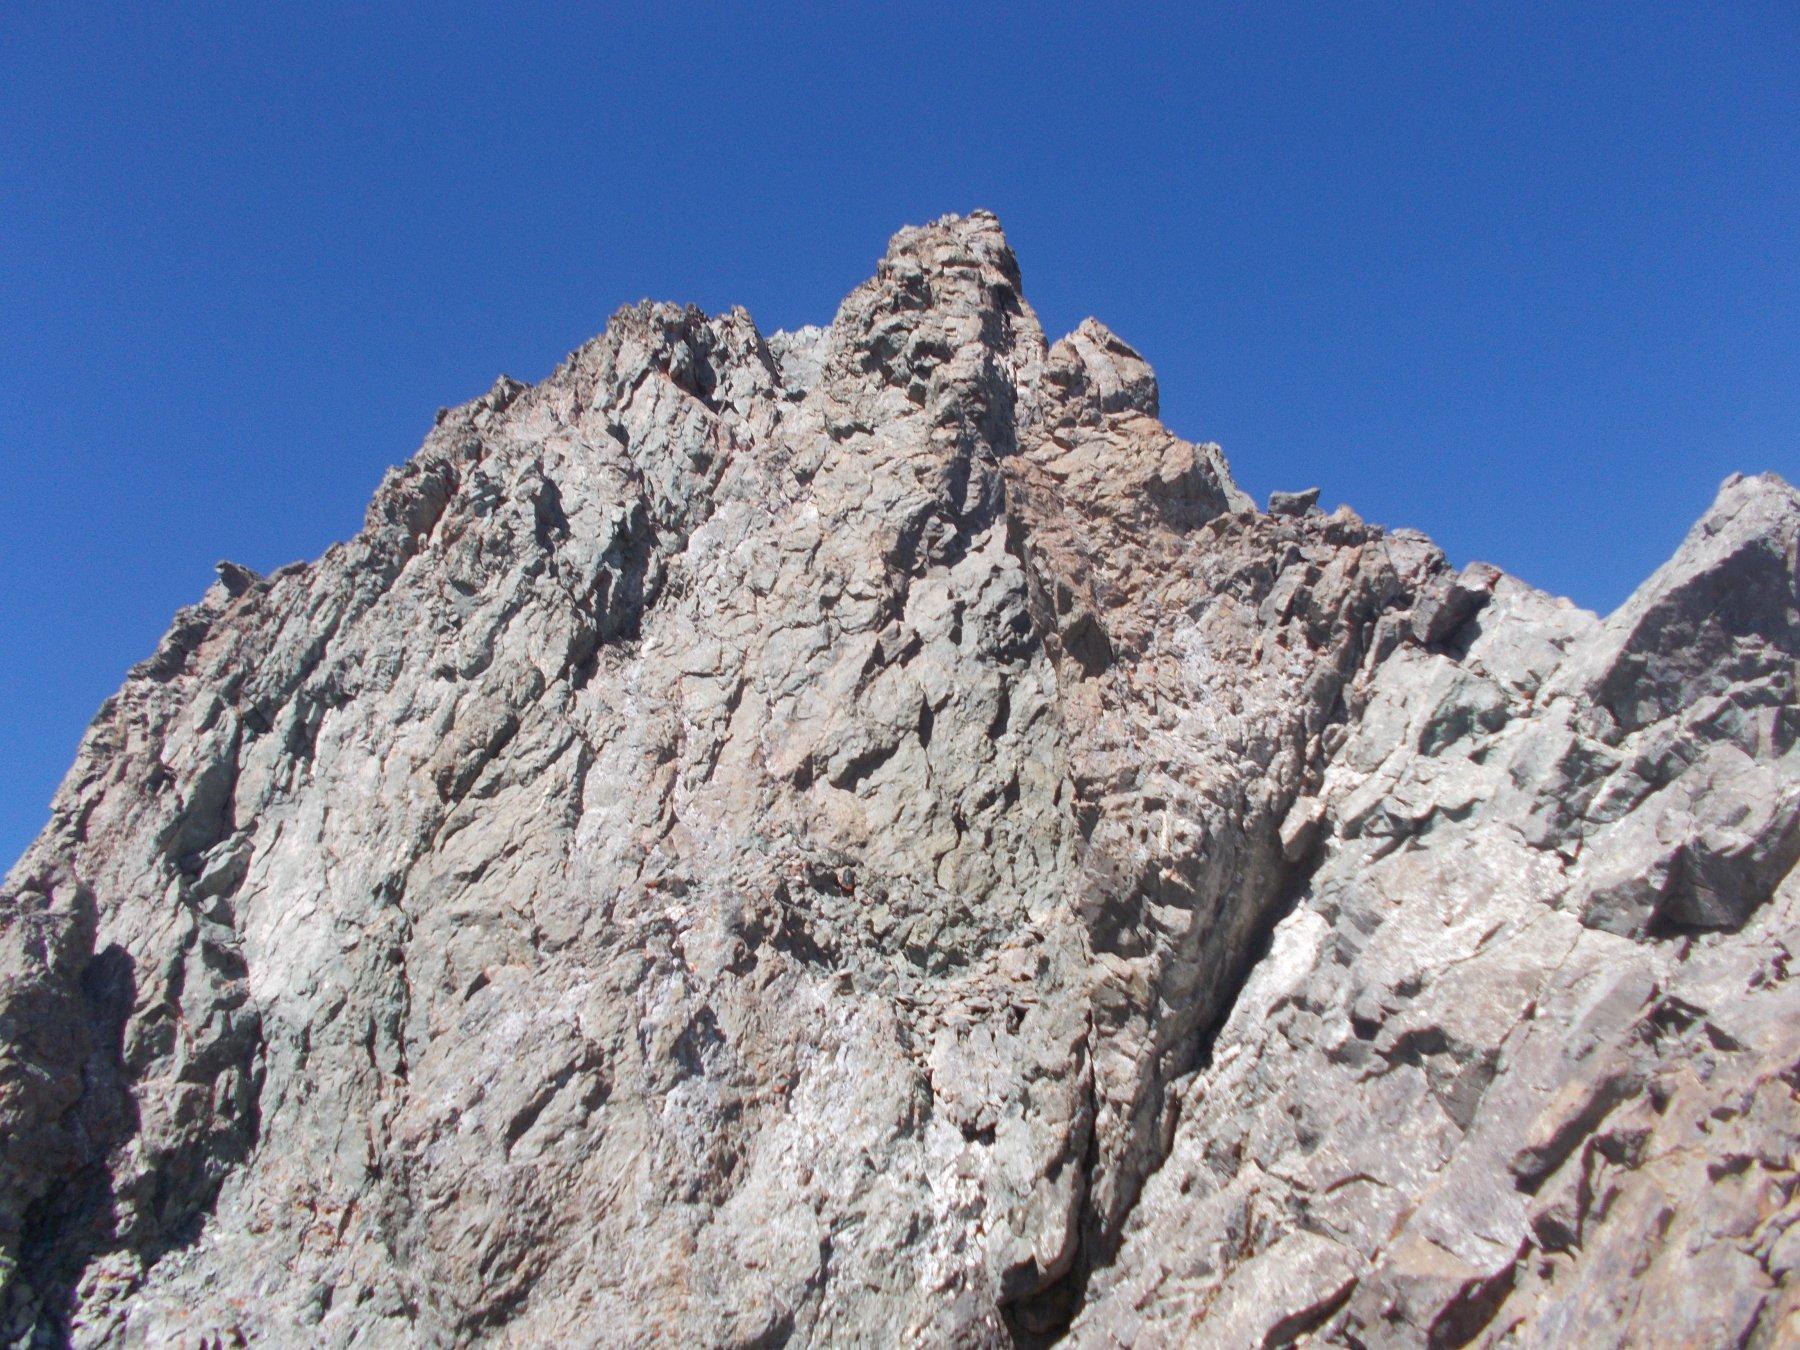 Bessanese (Uja di) Cresta Sud per le punte del Crot, V.Teja, Balme, la Dentina, Rosenkrantz 2017-10-11